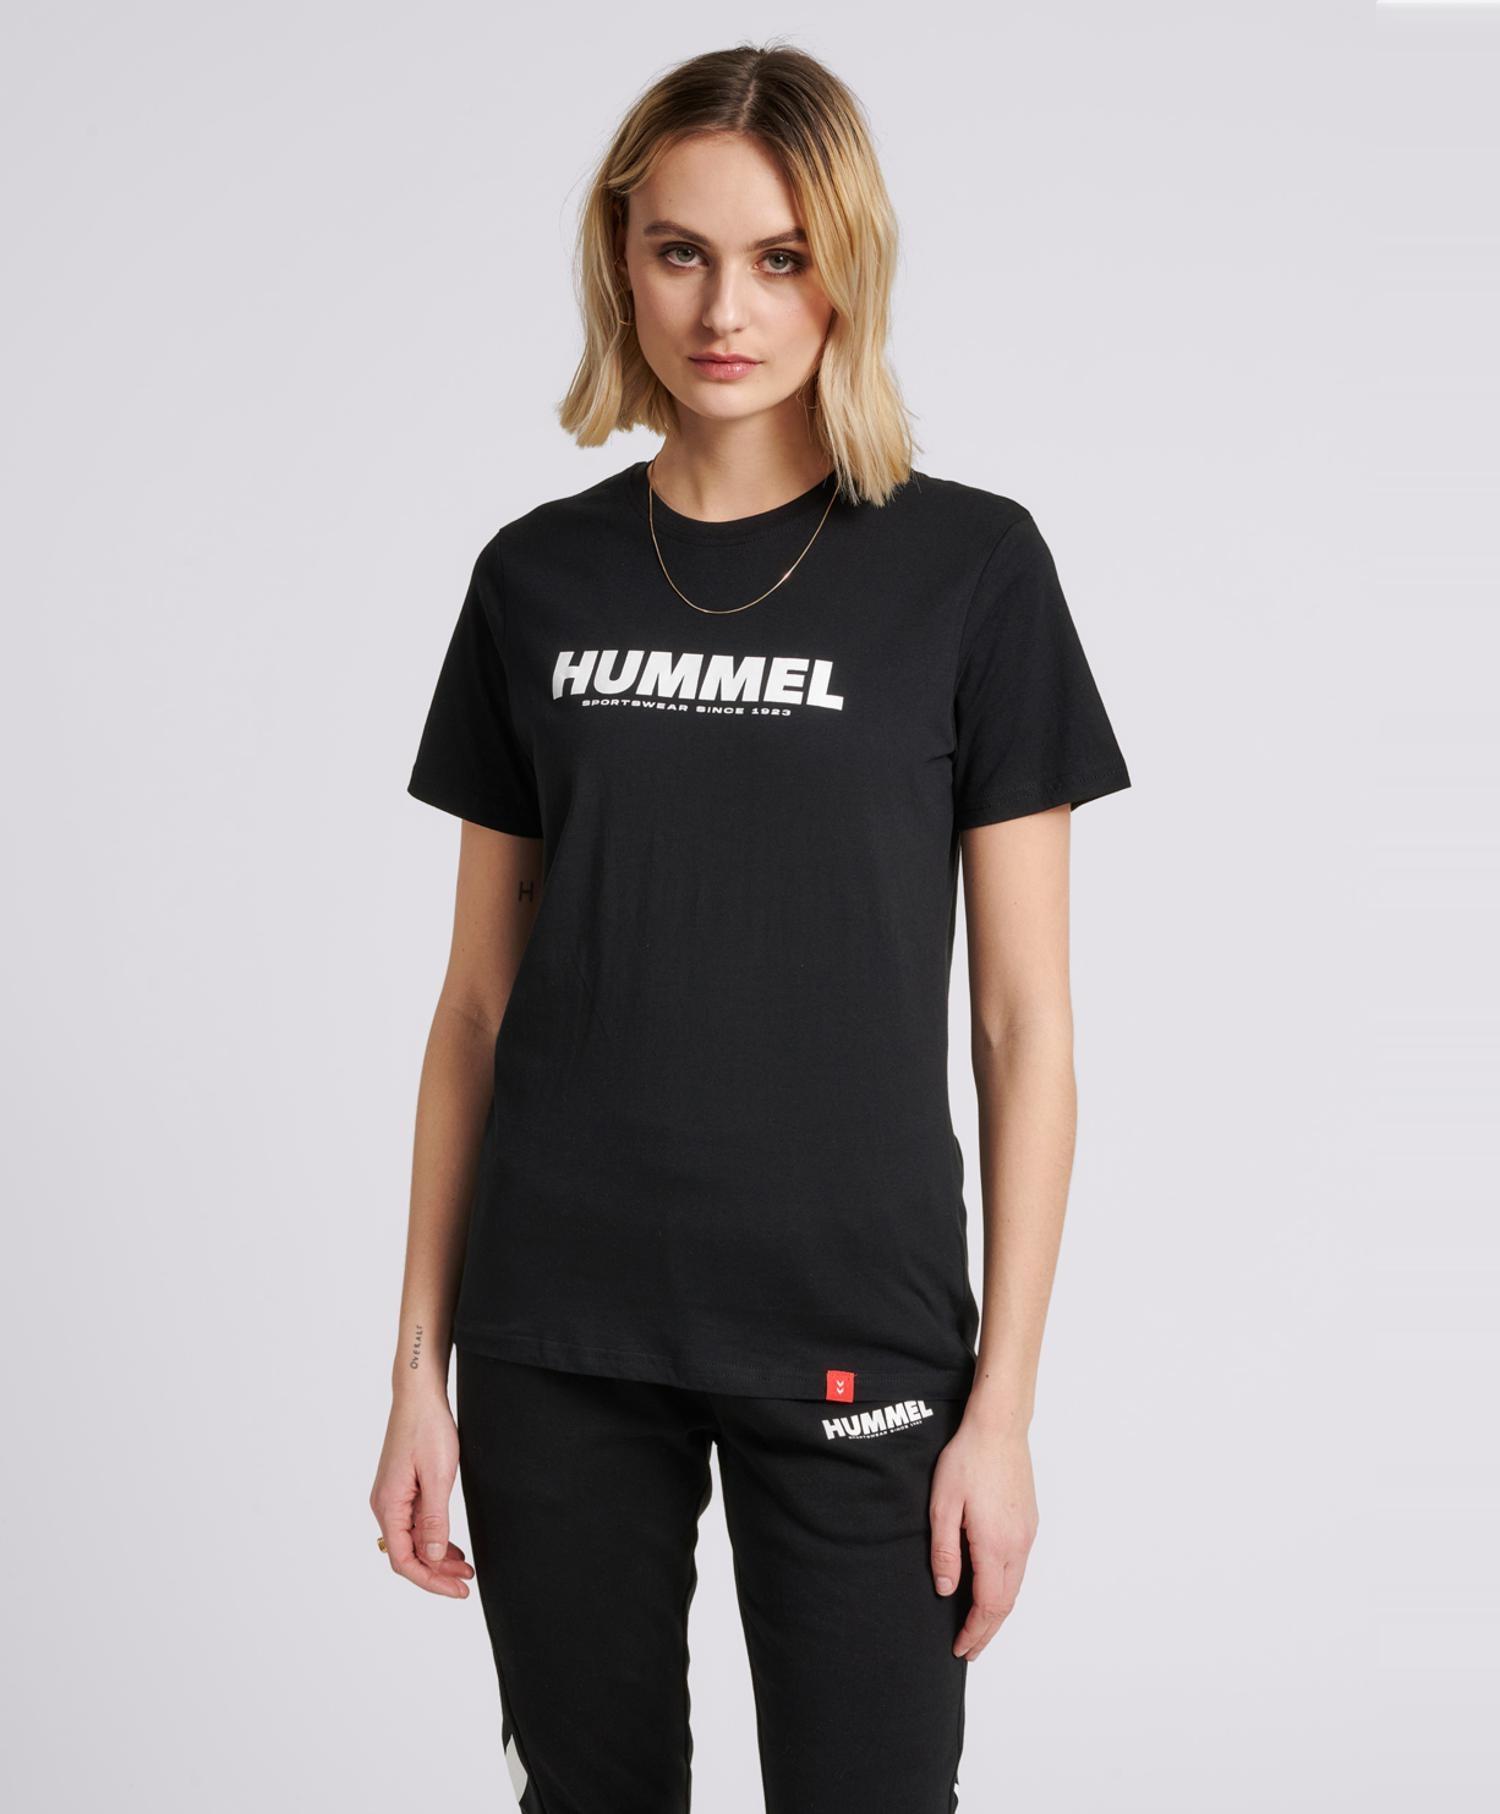 Hummel Legacy T-shirt